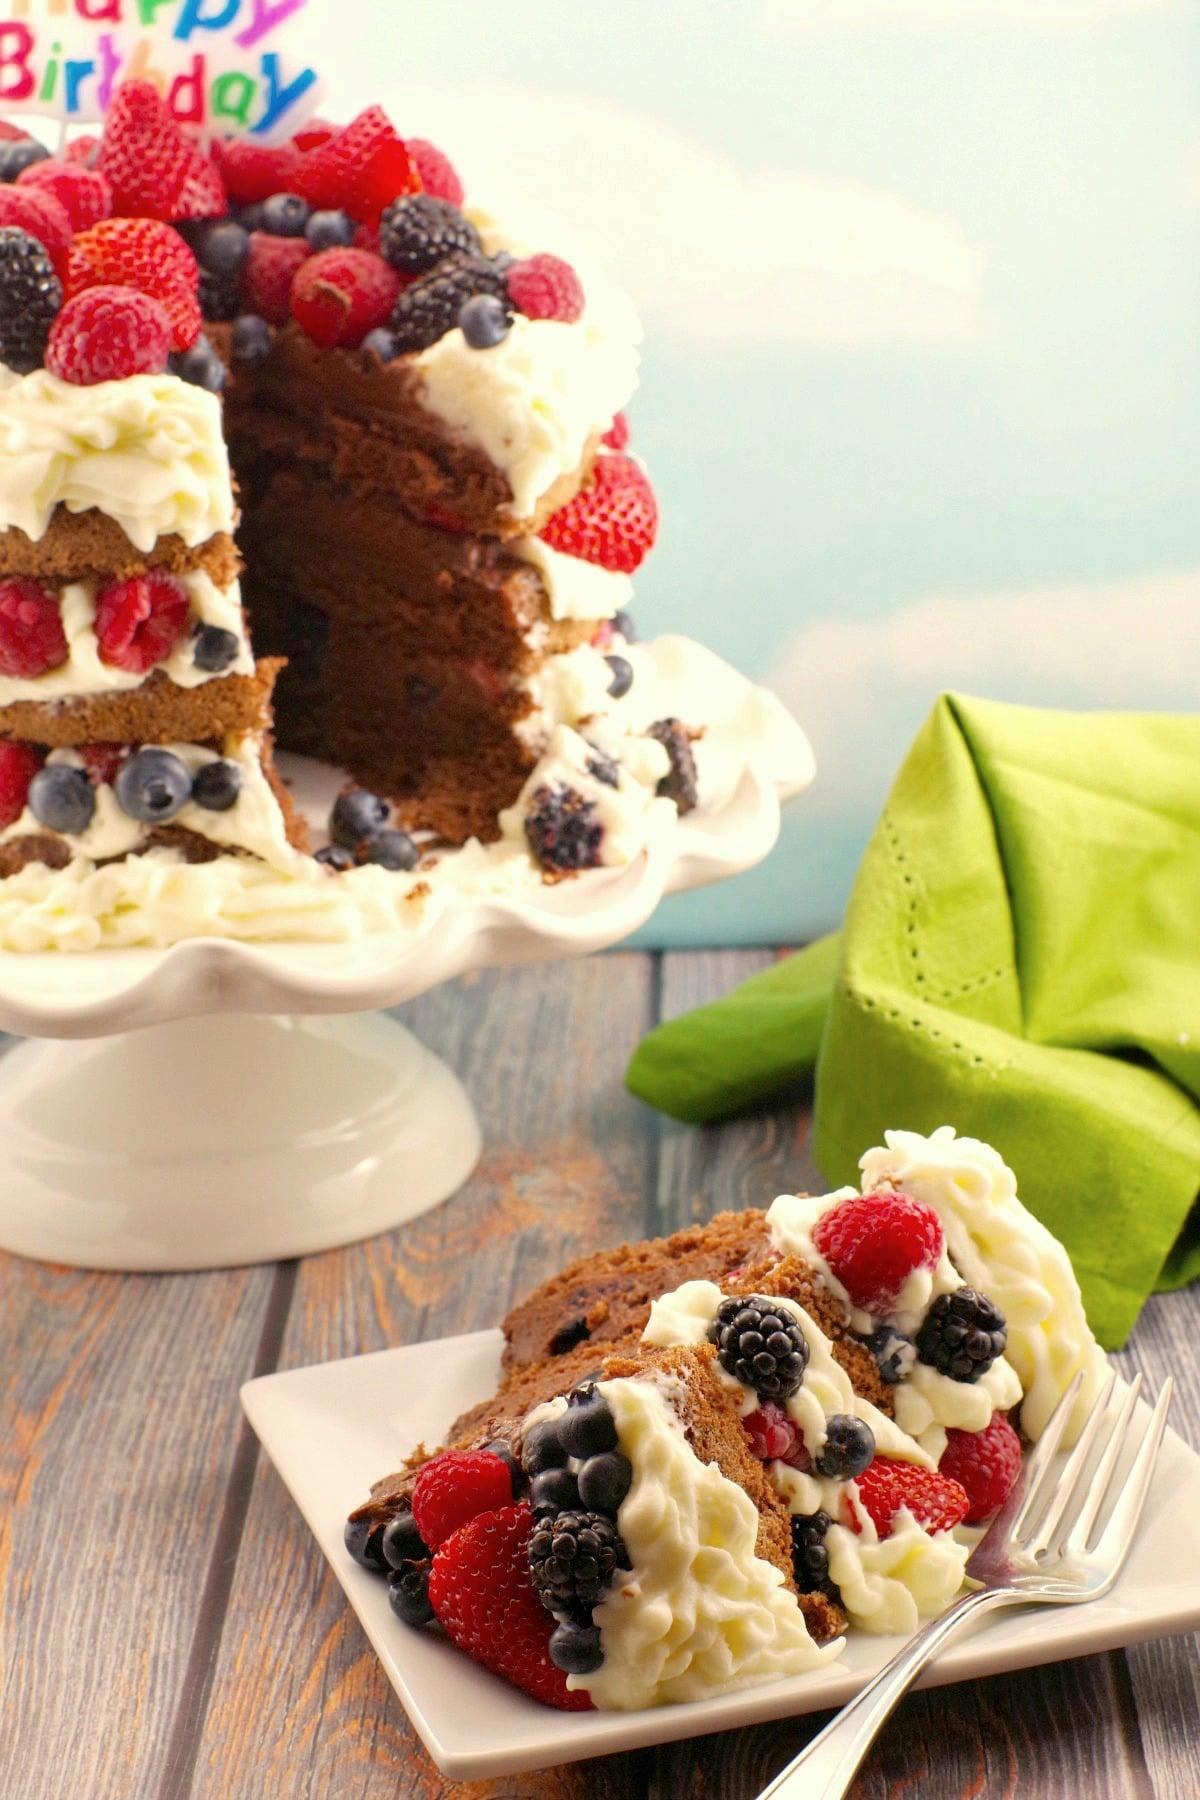 Chocolate Italian Sponge Cake with summer berries- sliced